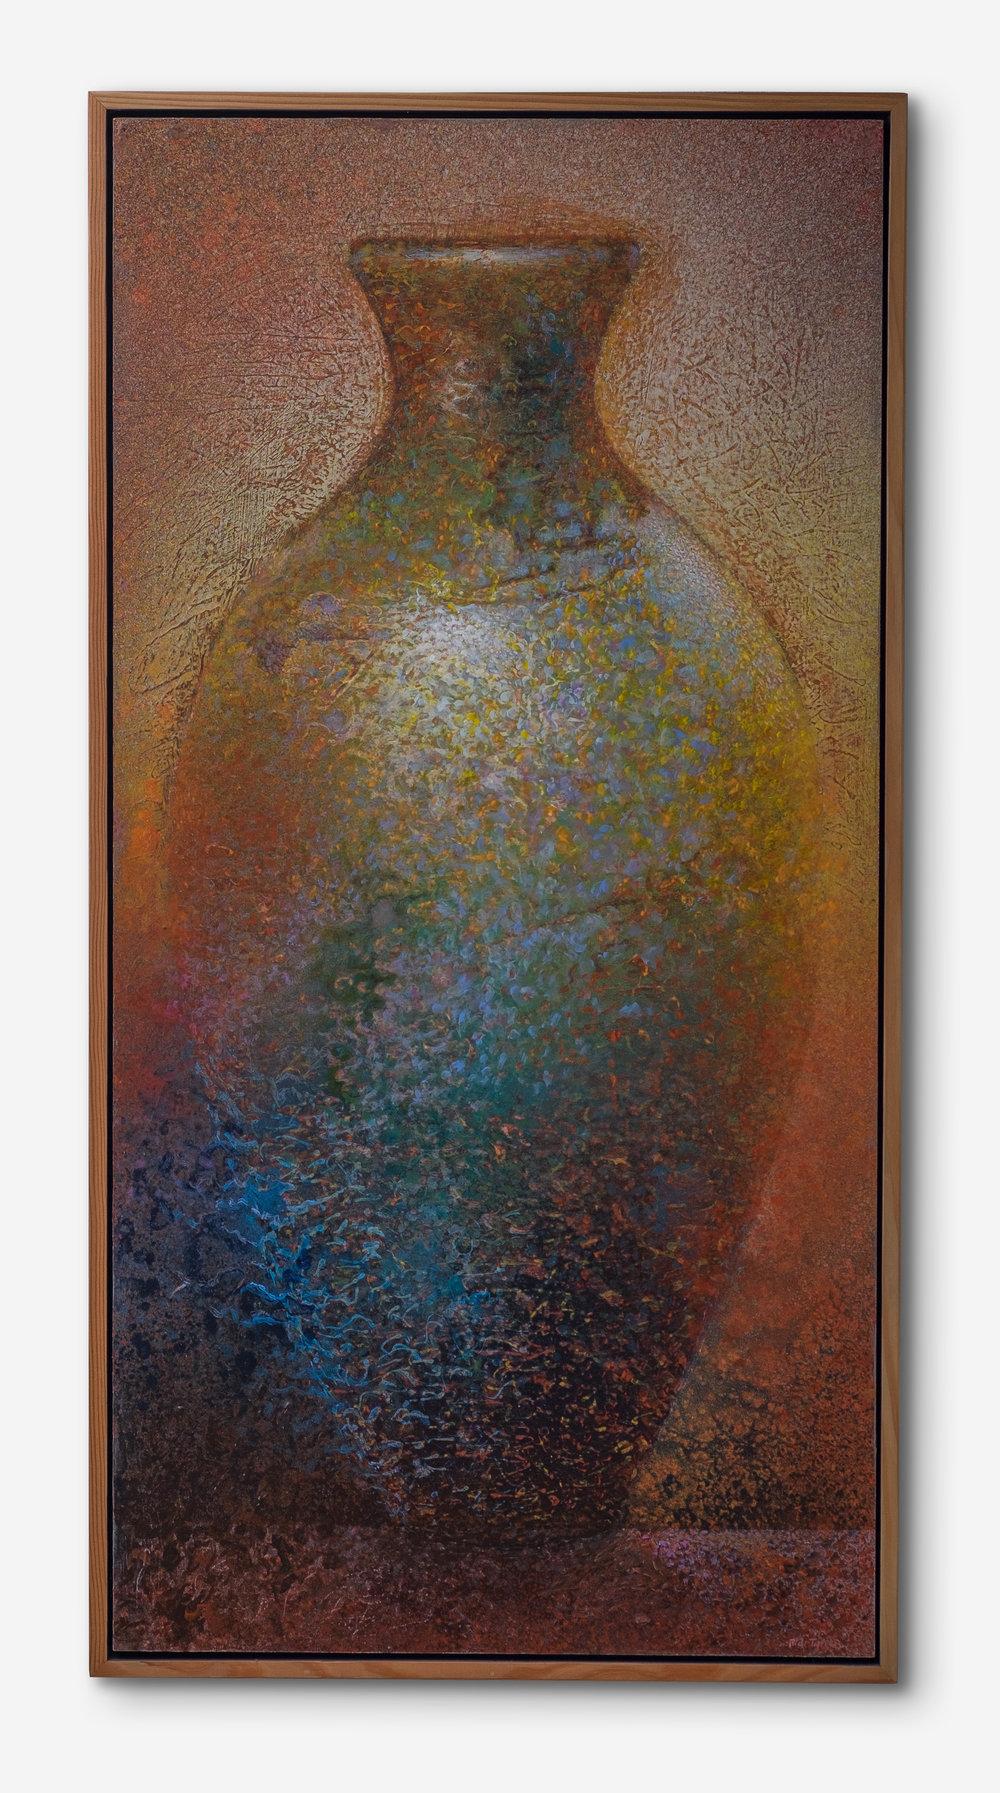 Earth Vase #31